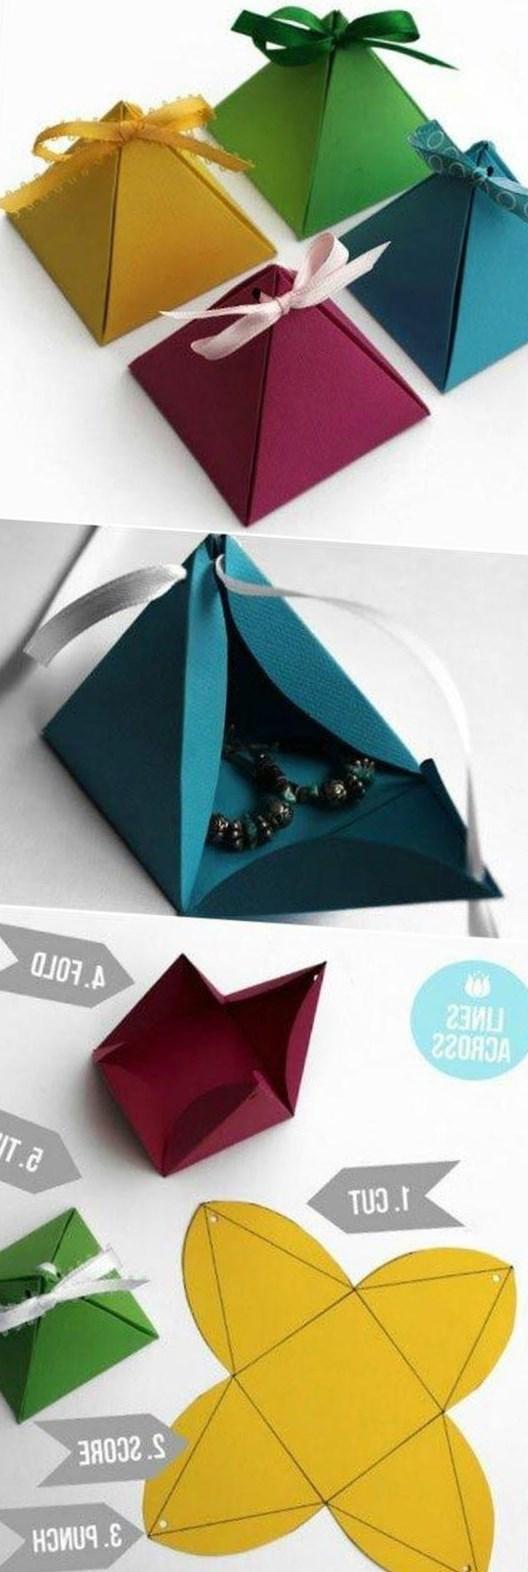 Креативная упаковка для подарка своими руками 98